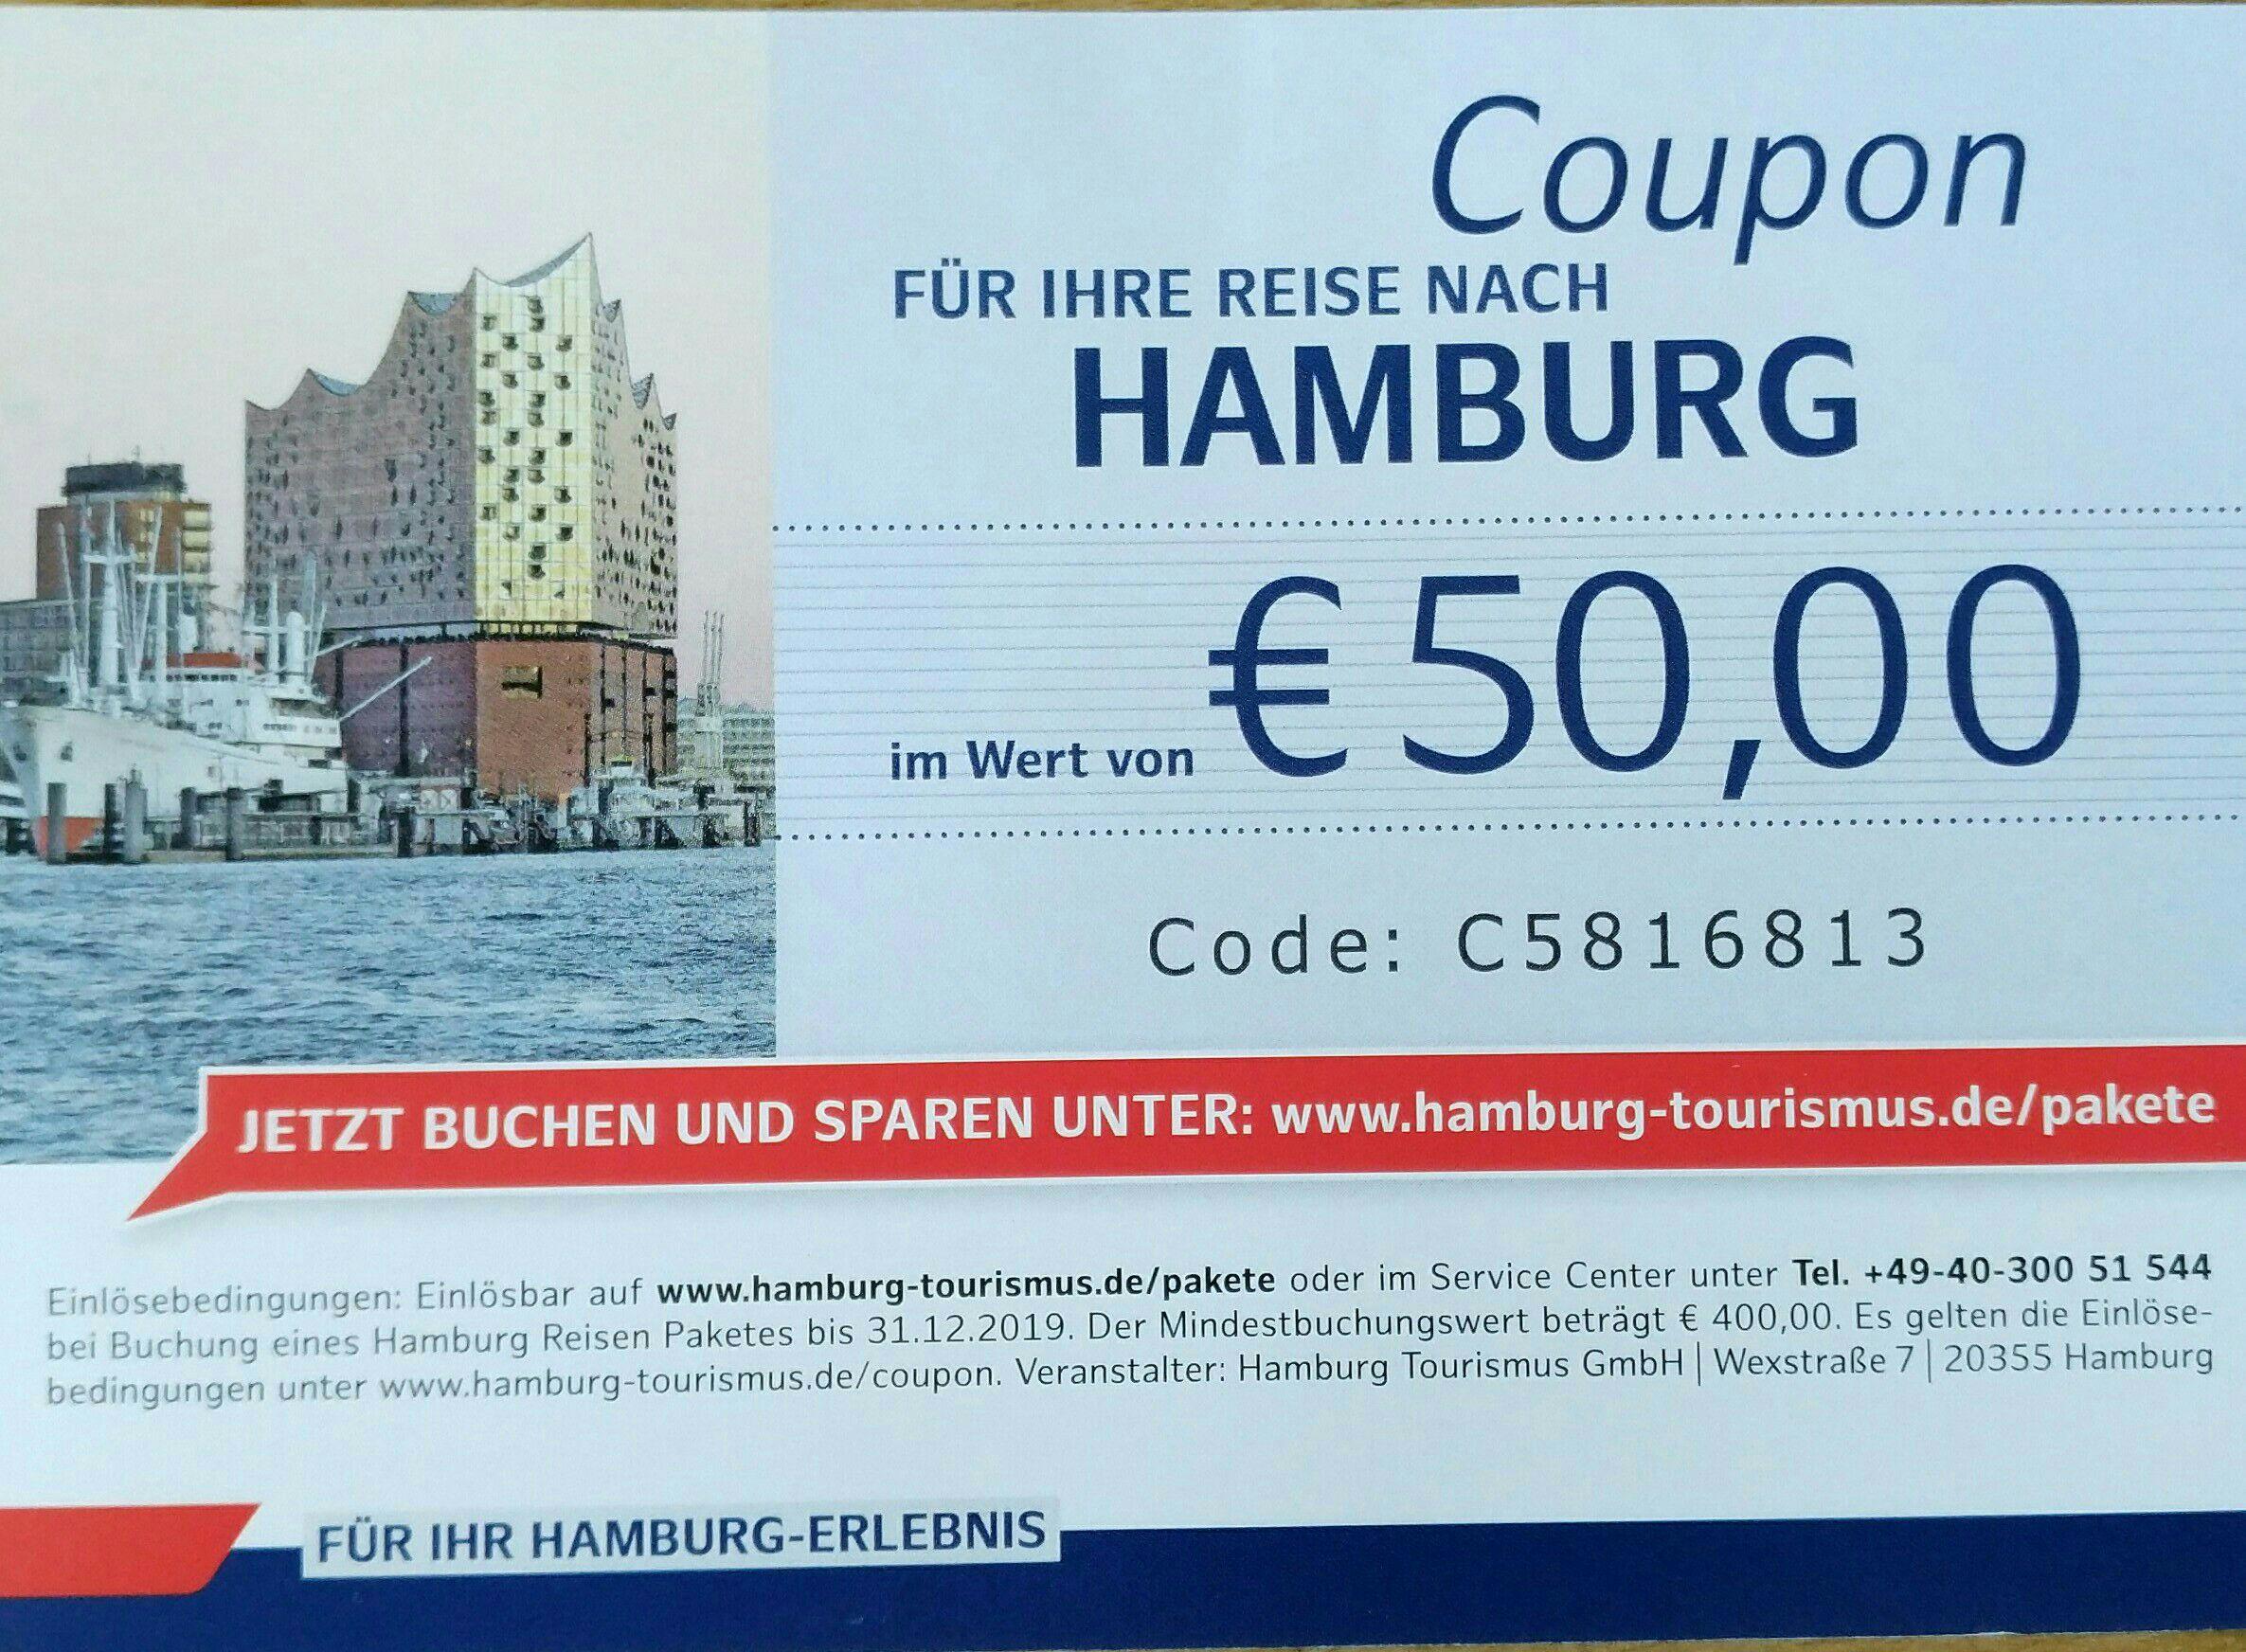 Hamburg Reise Pakete -50€